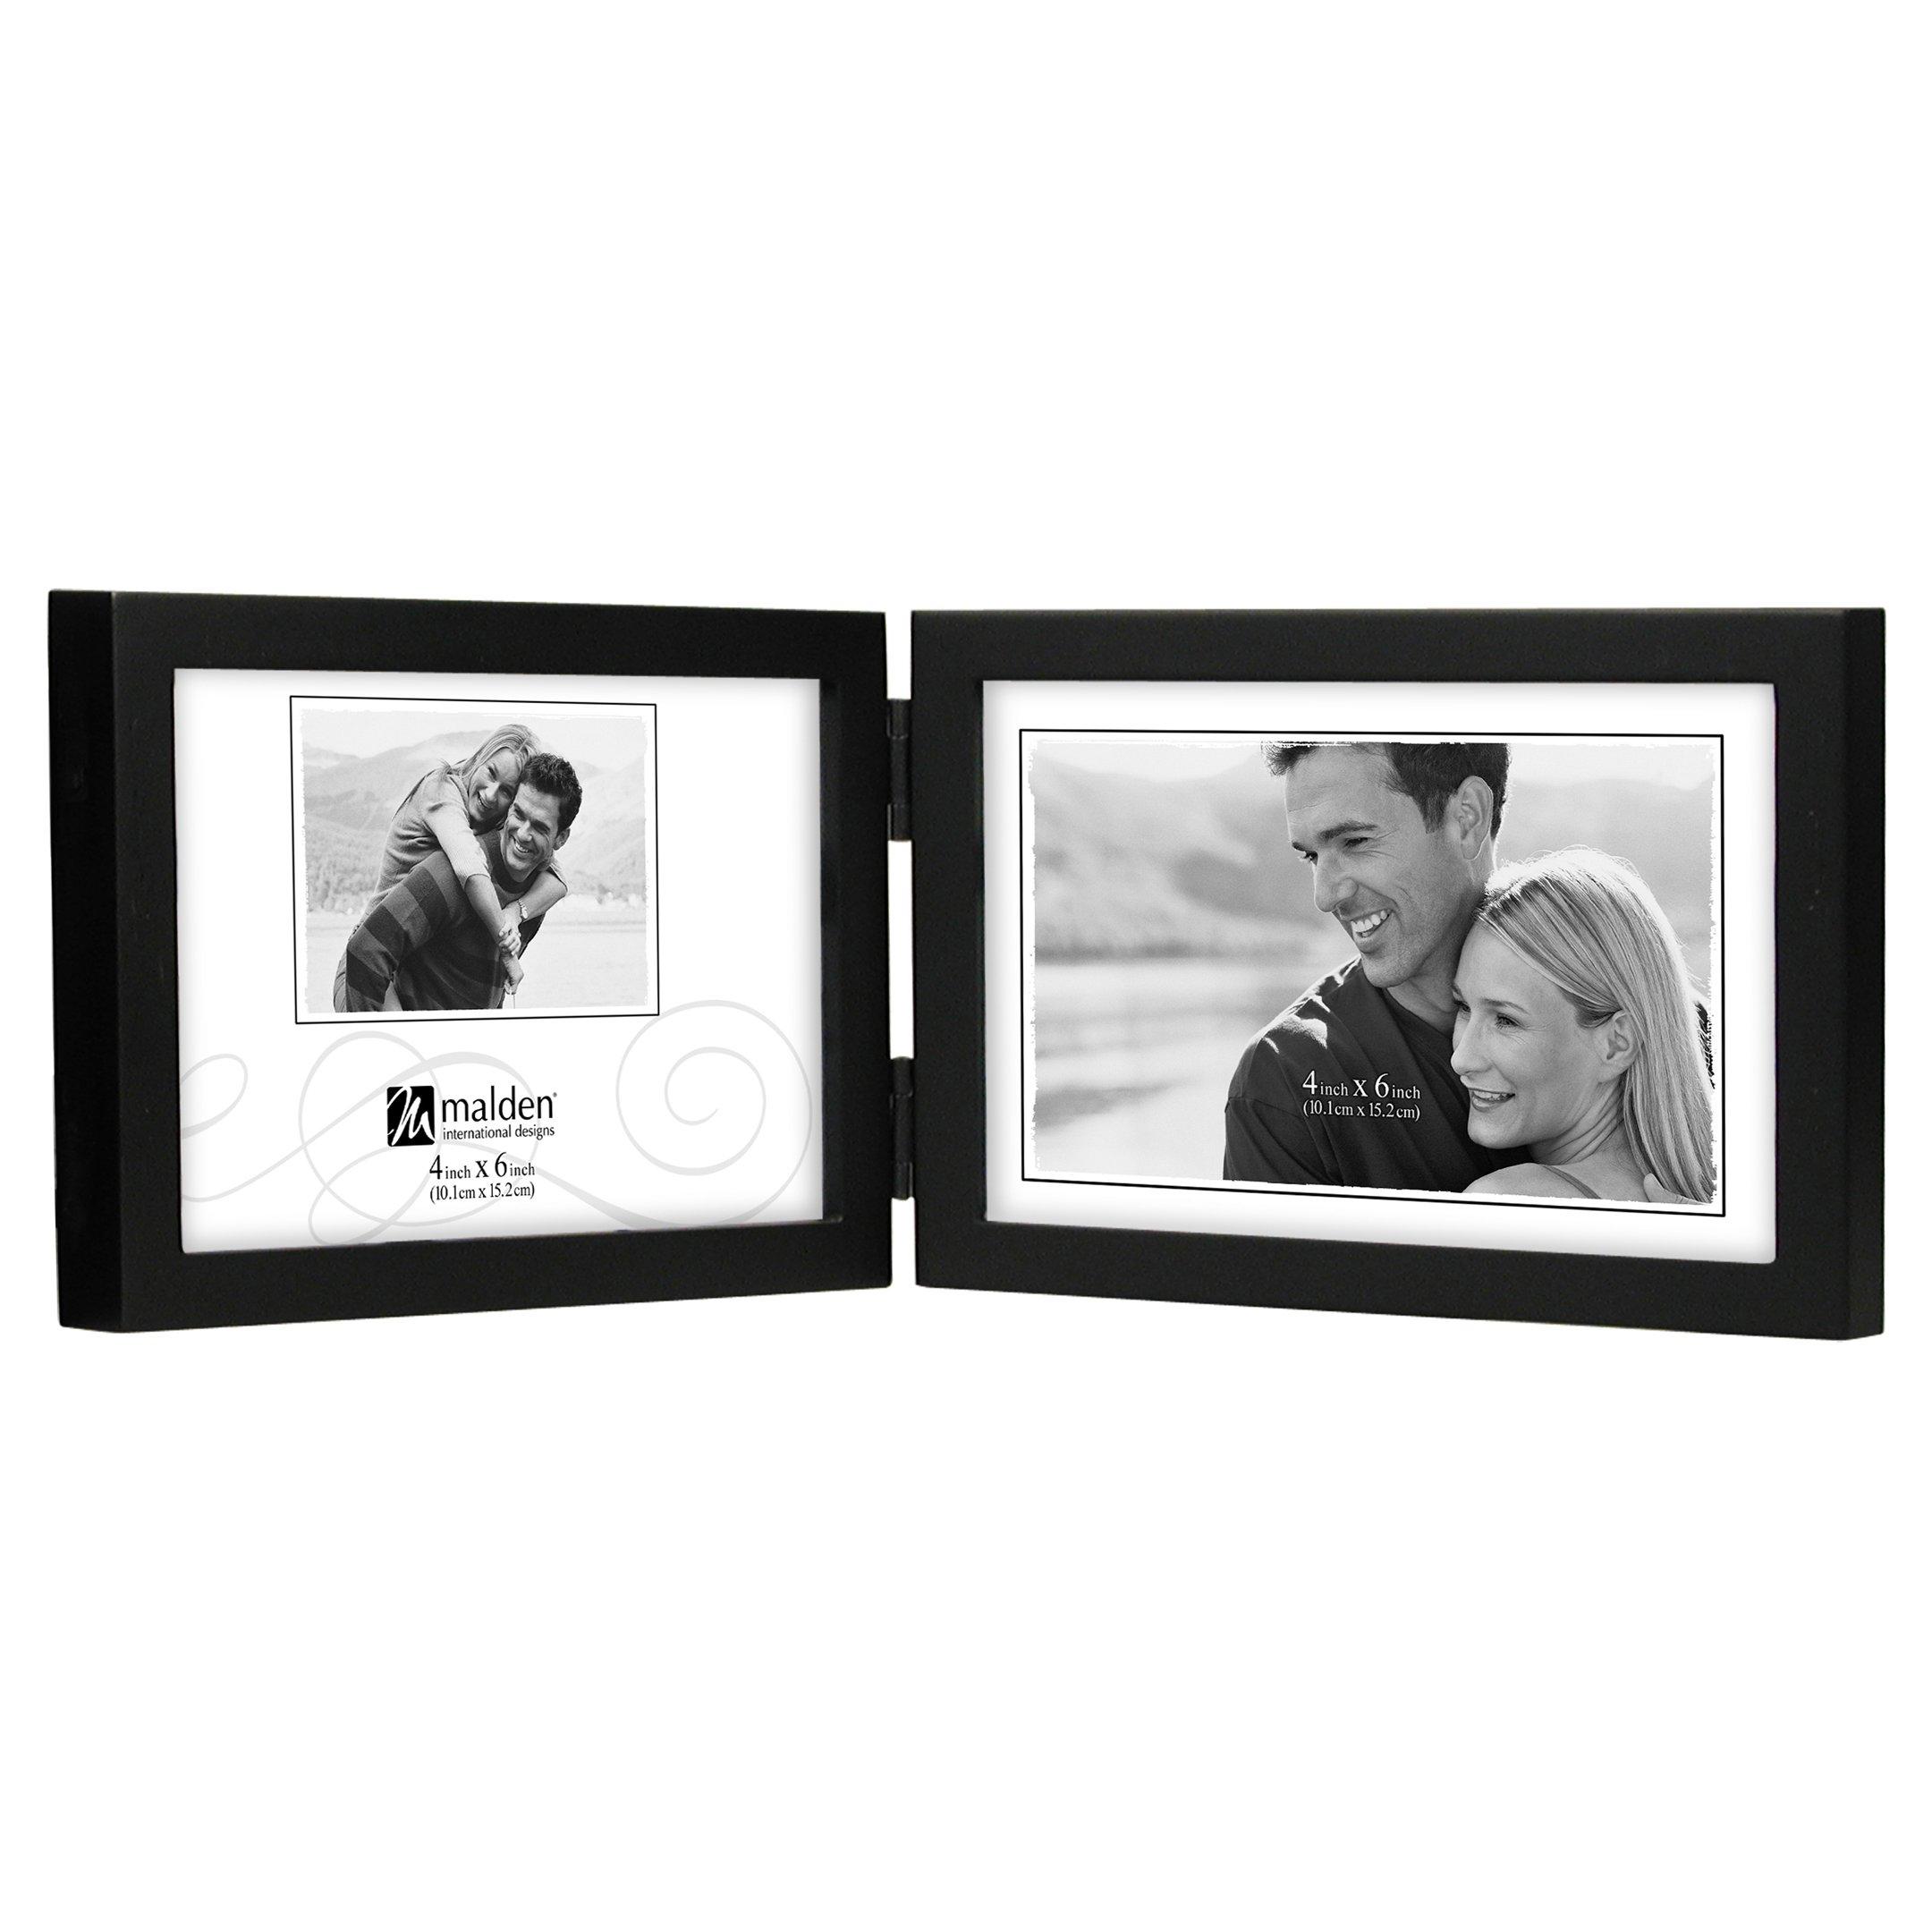 Malden International Designs Black Concept Wood Picture Frame, Double Horizontal, 2-5x7, Black by Malden International Designs